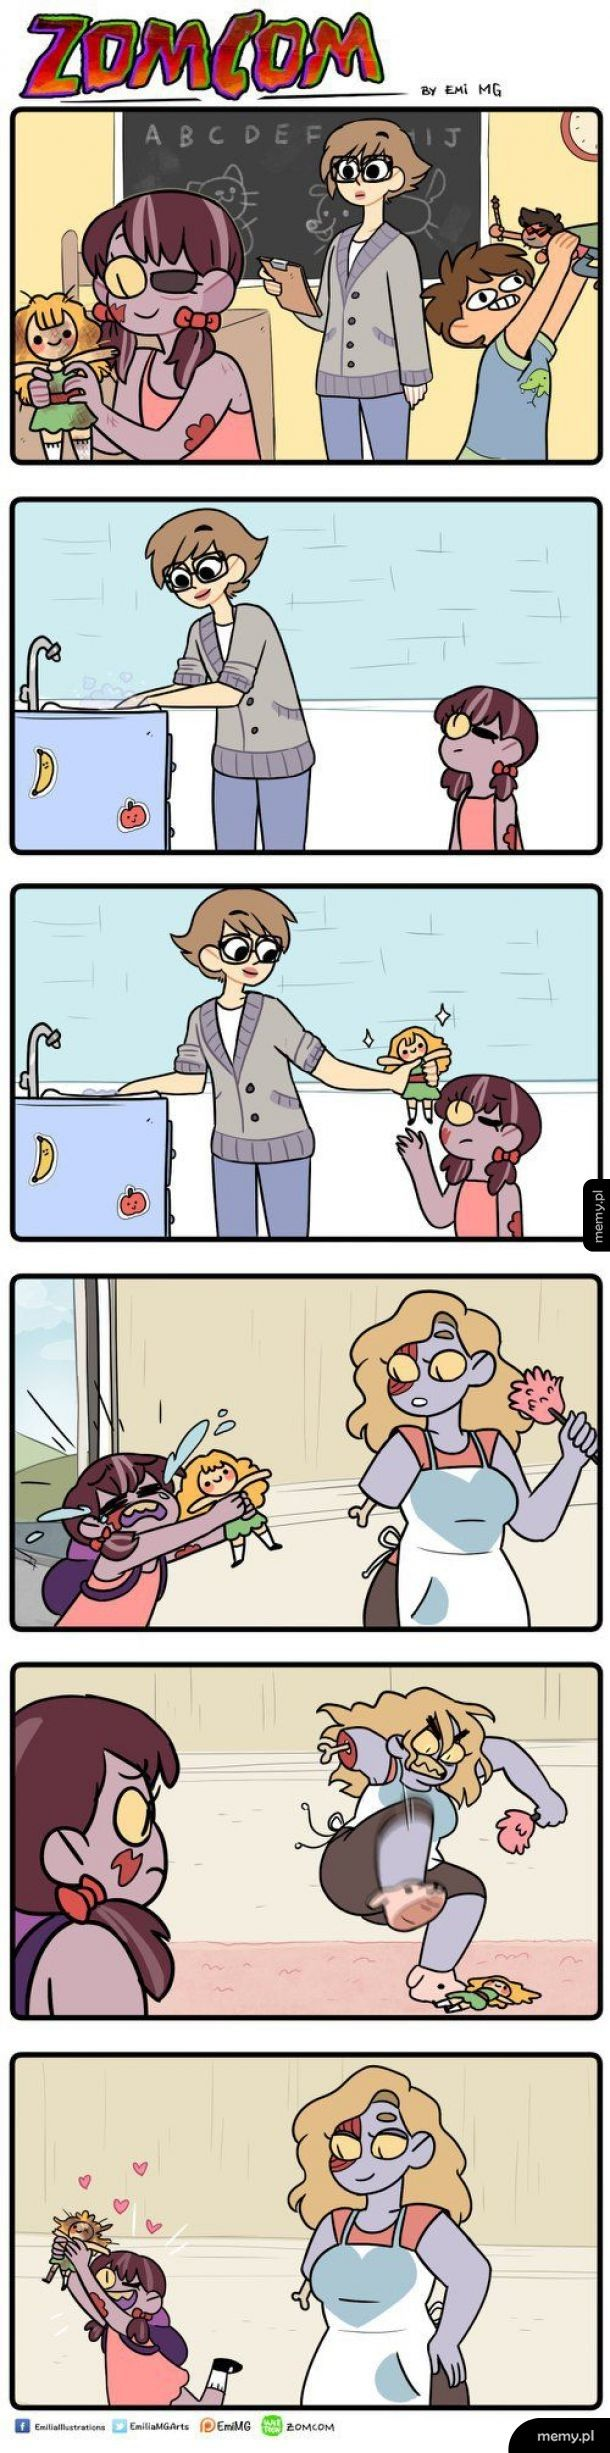 Brzydka lalka